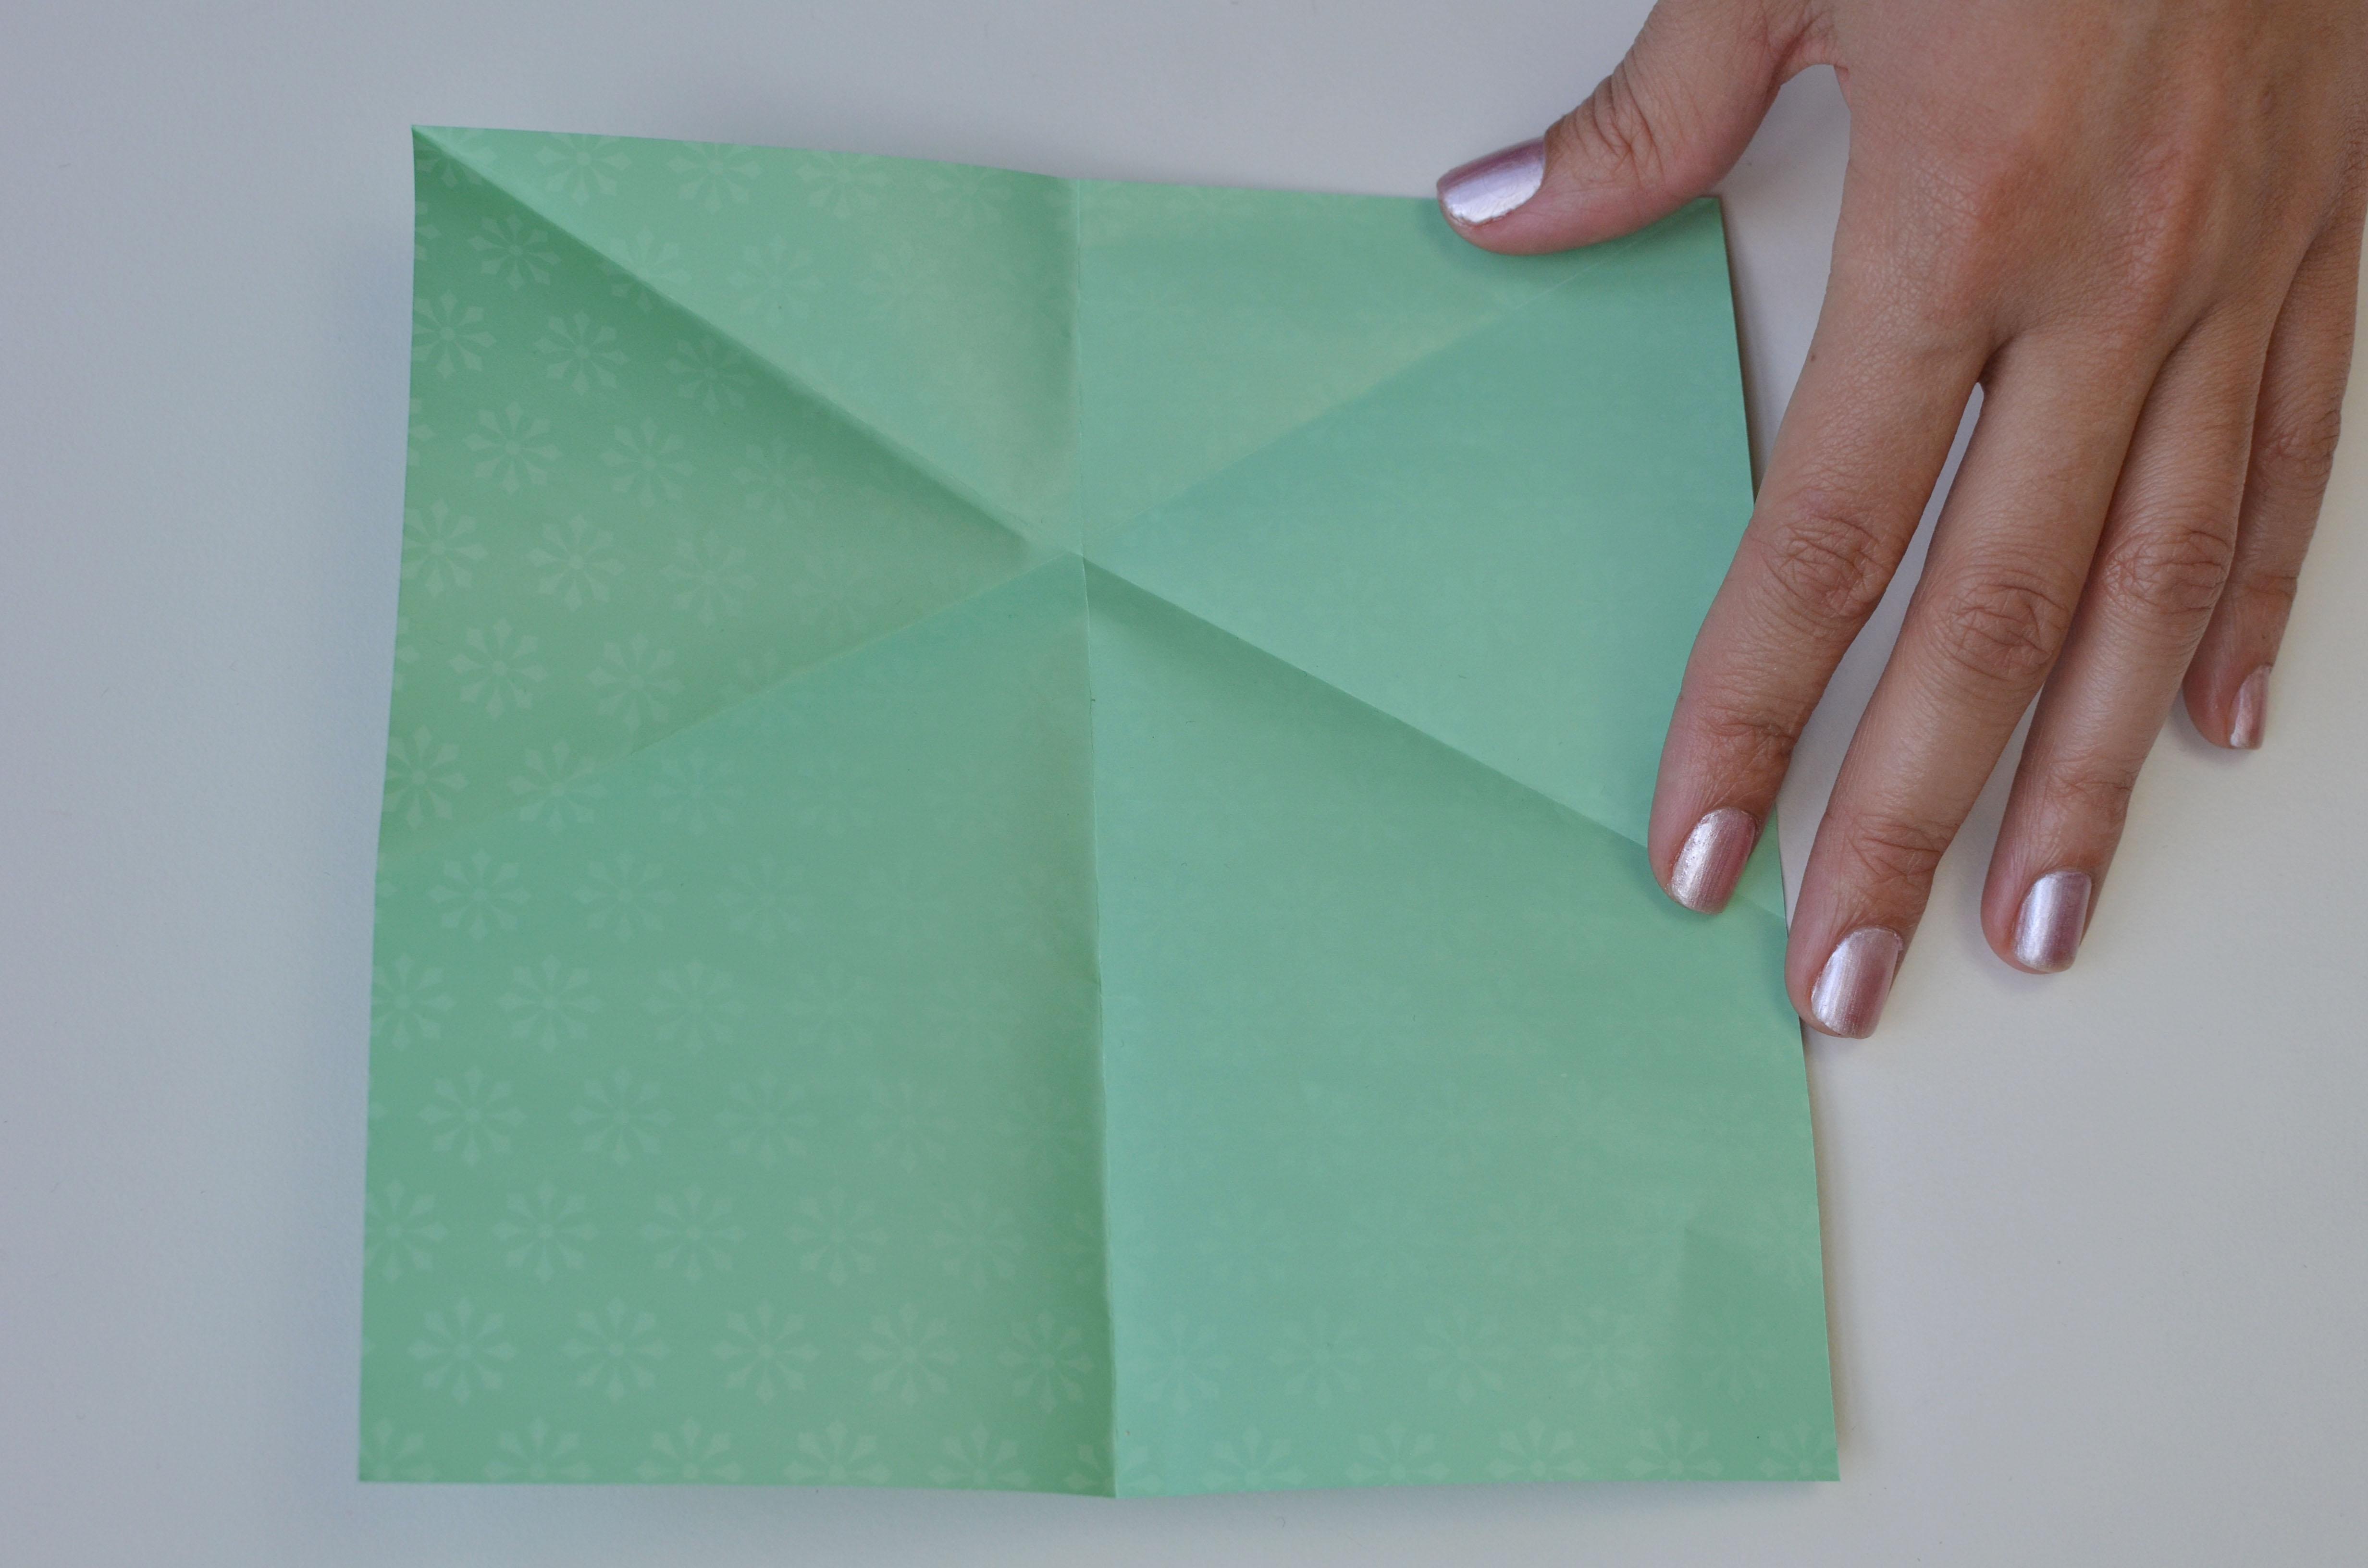 braincrafts_frog_origami_pt6.jpg